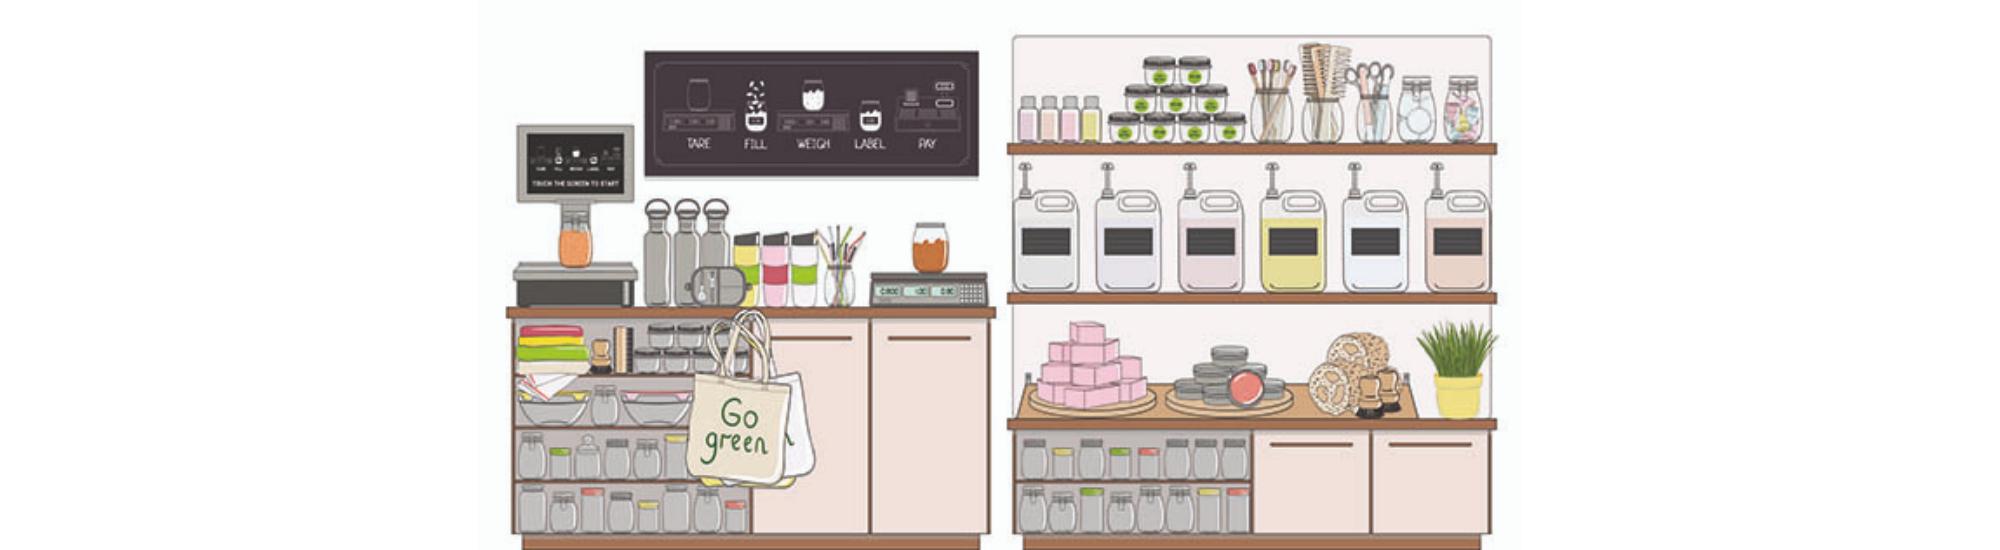 fabricant savons saponifies a froid distribuer savon bio artisanal